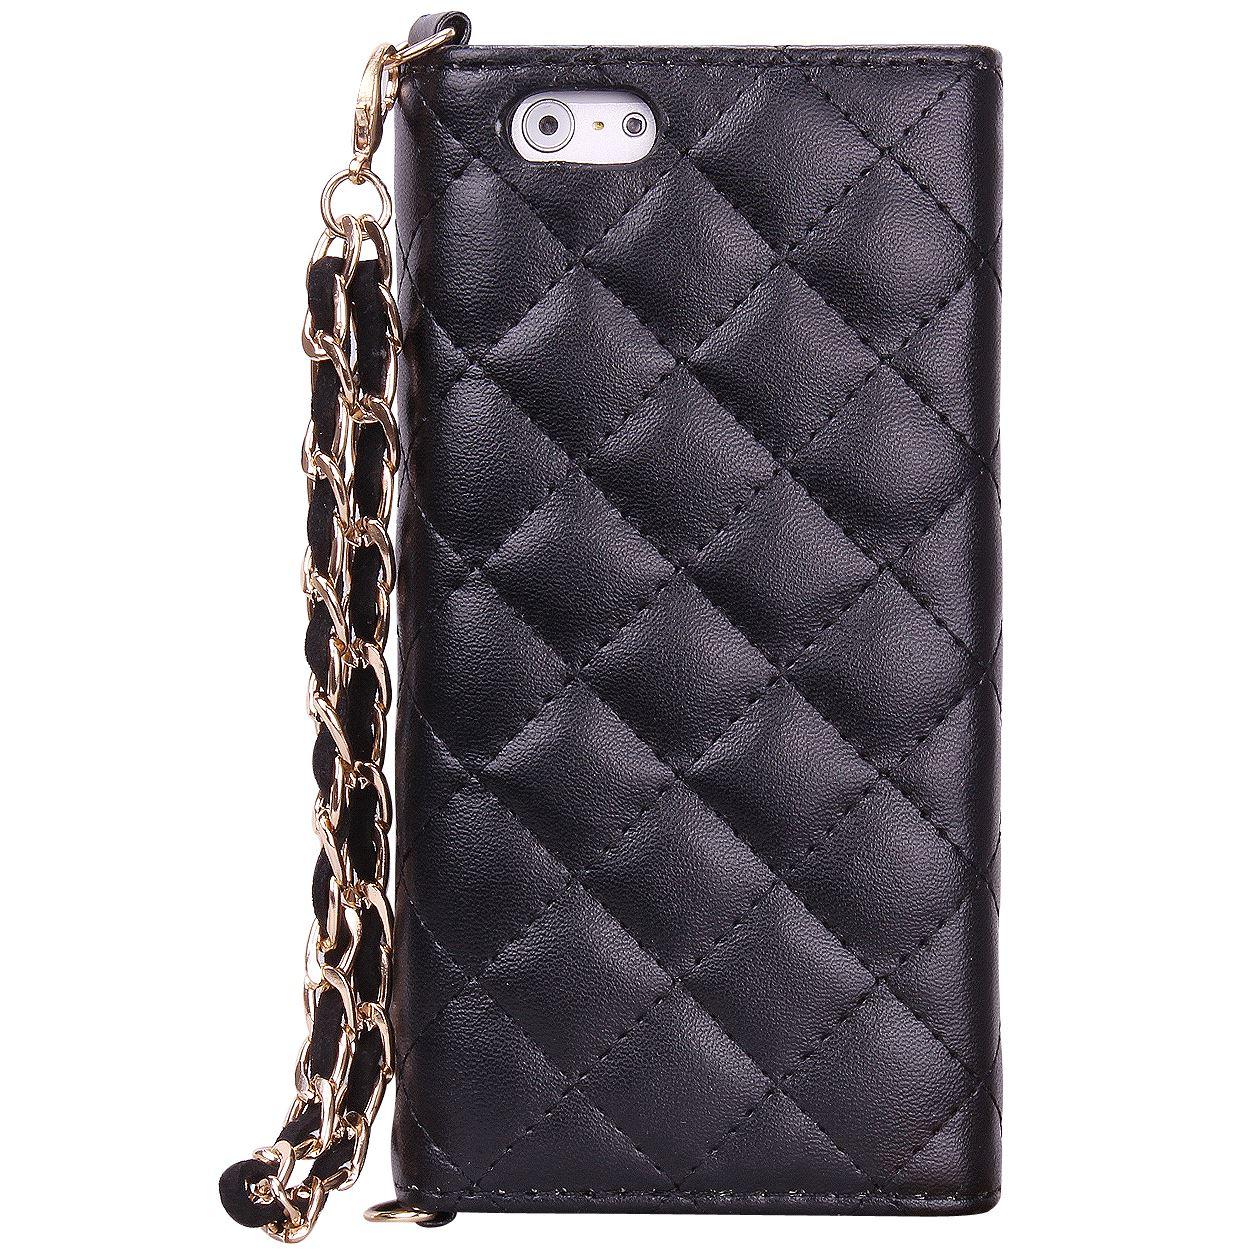 true color premium designer iphone 6 wristlet wallet case cross body purse ebay. Black Bedroom Furniture Sets. Home Design Ideas